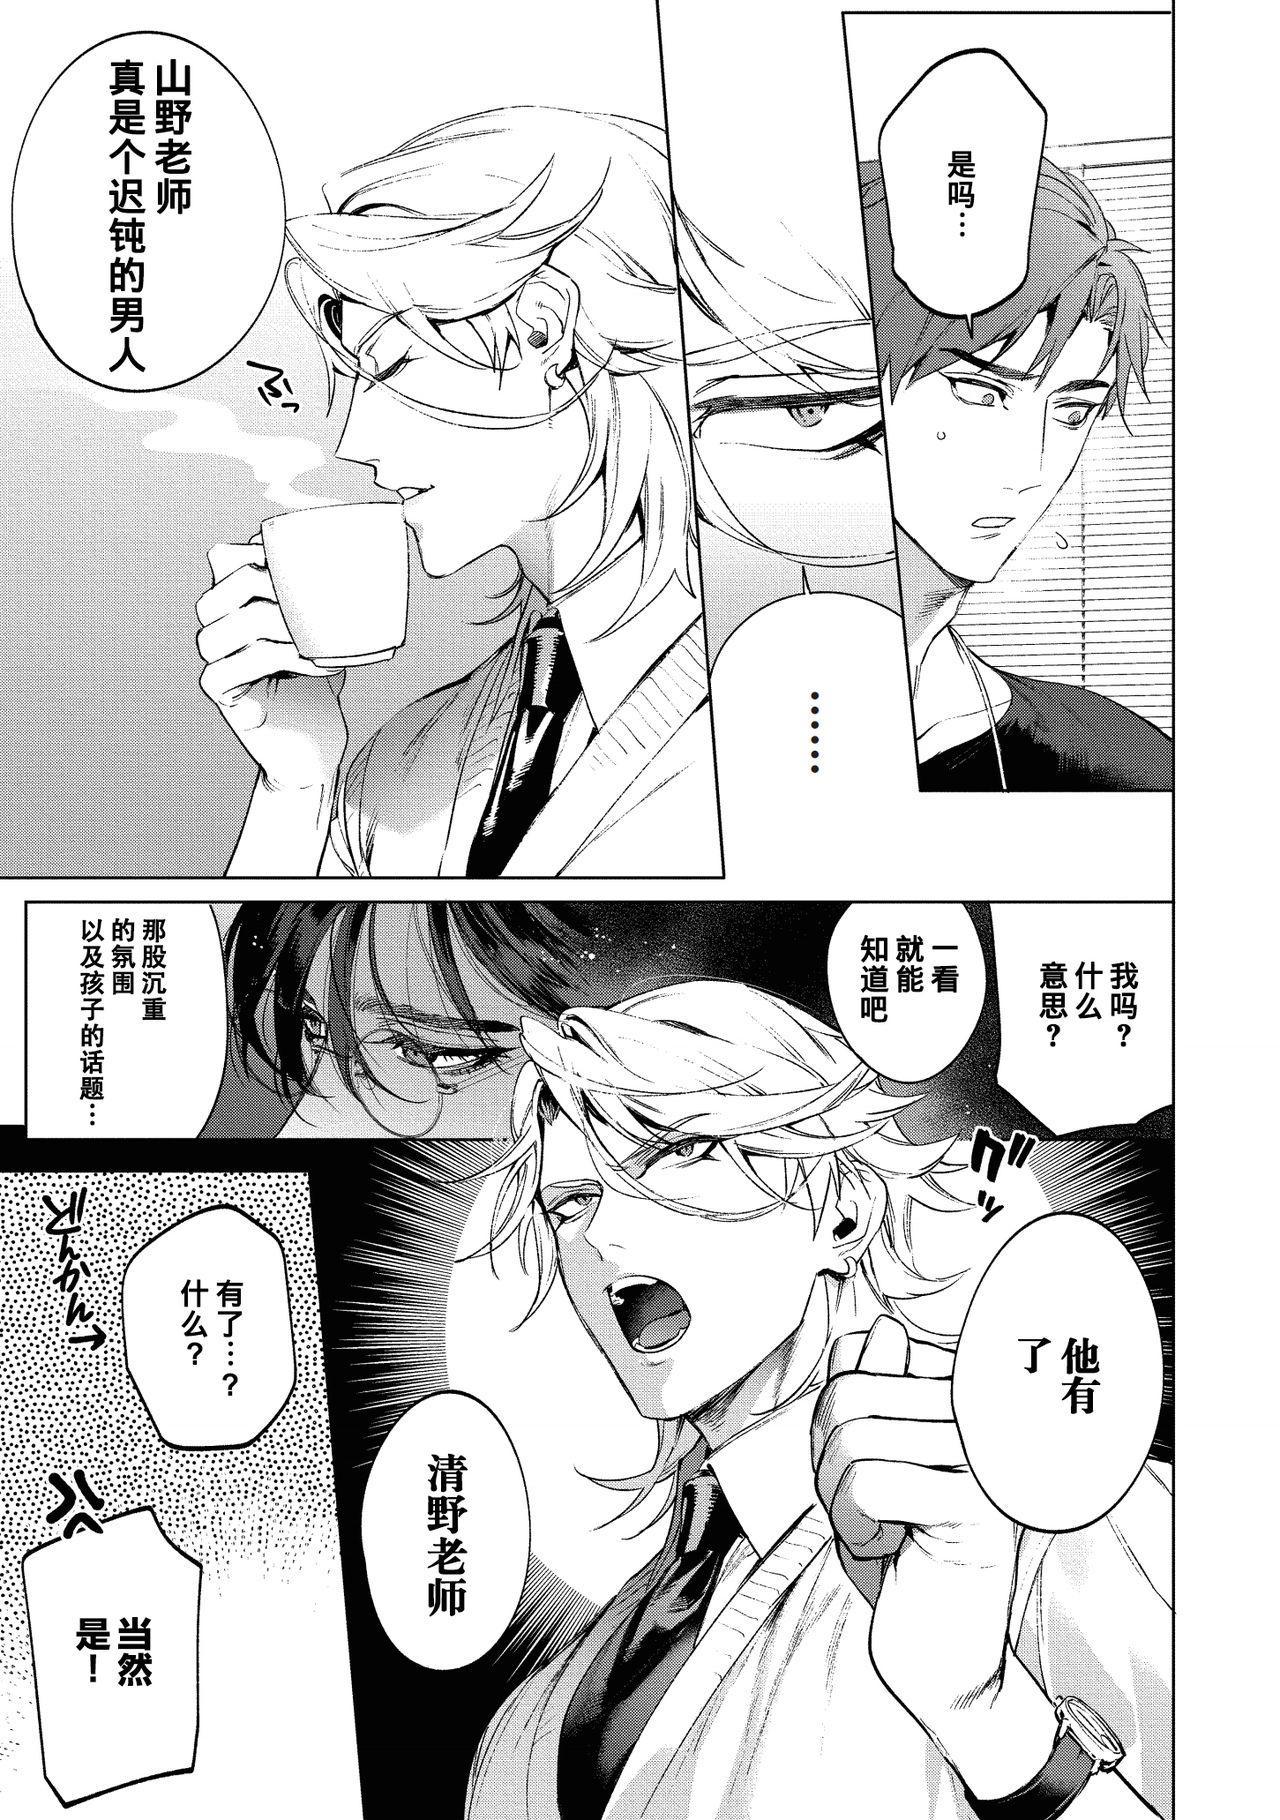 Sensei wa Benki ja Arimasen.3 | 老师不是便器。3 14